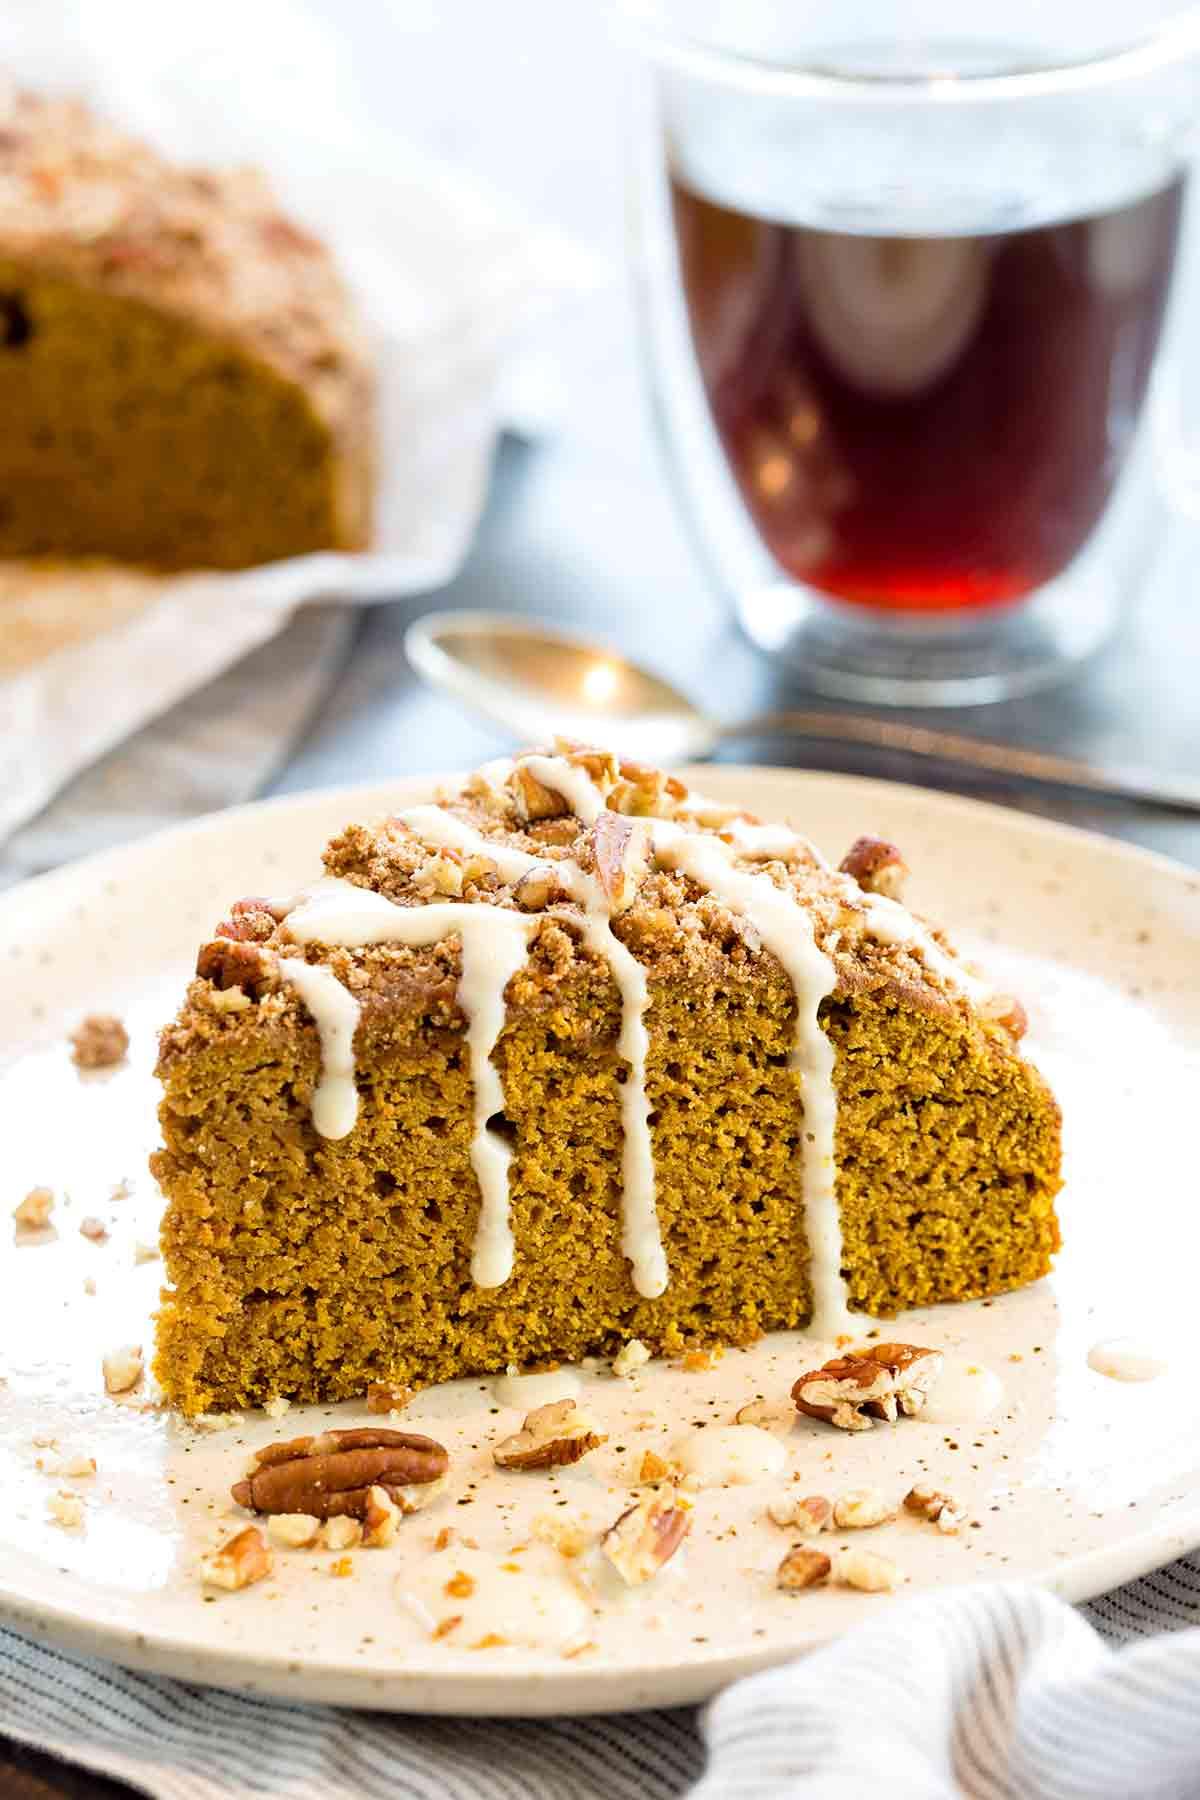 Slice of pumpkin coffee cake with vanilla yogurt drizzled on top